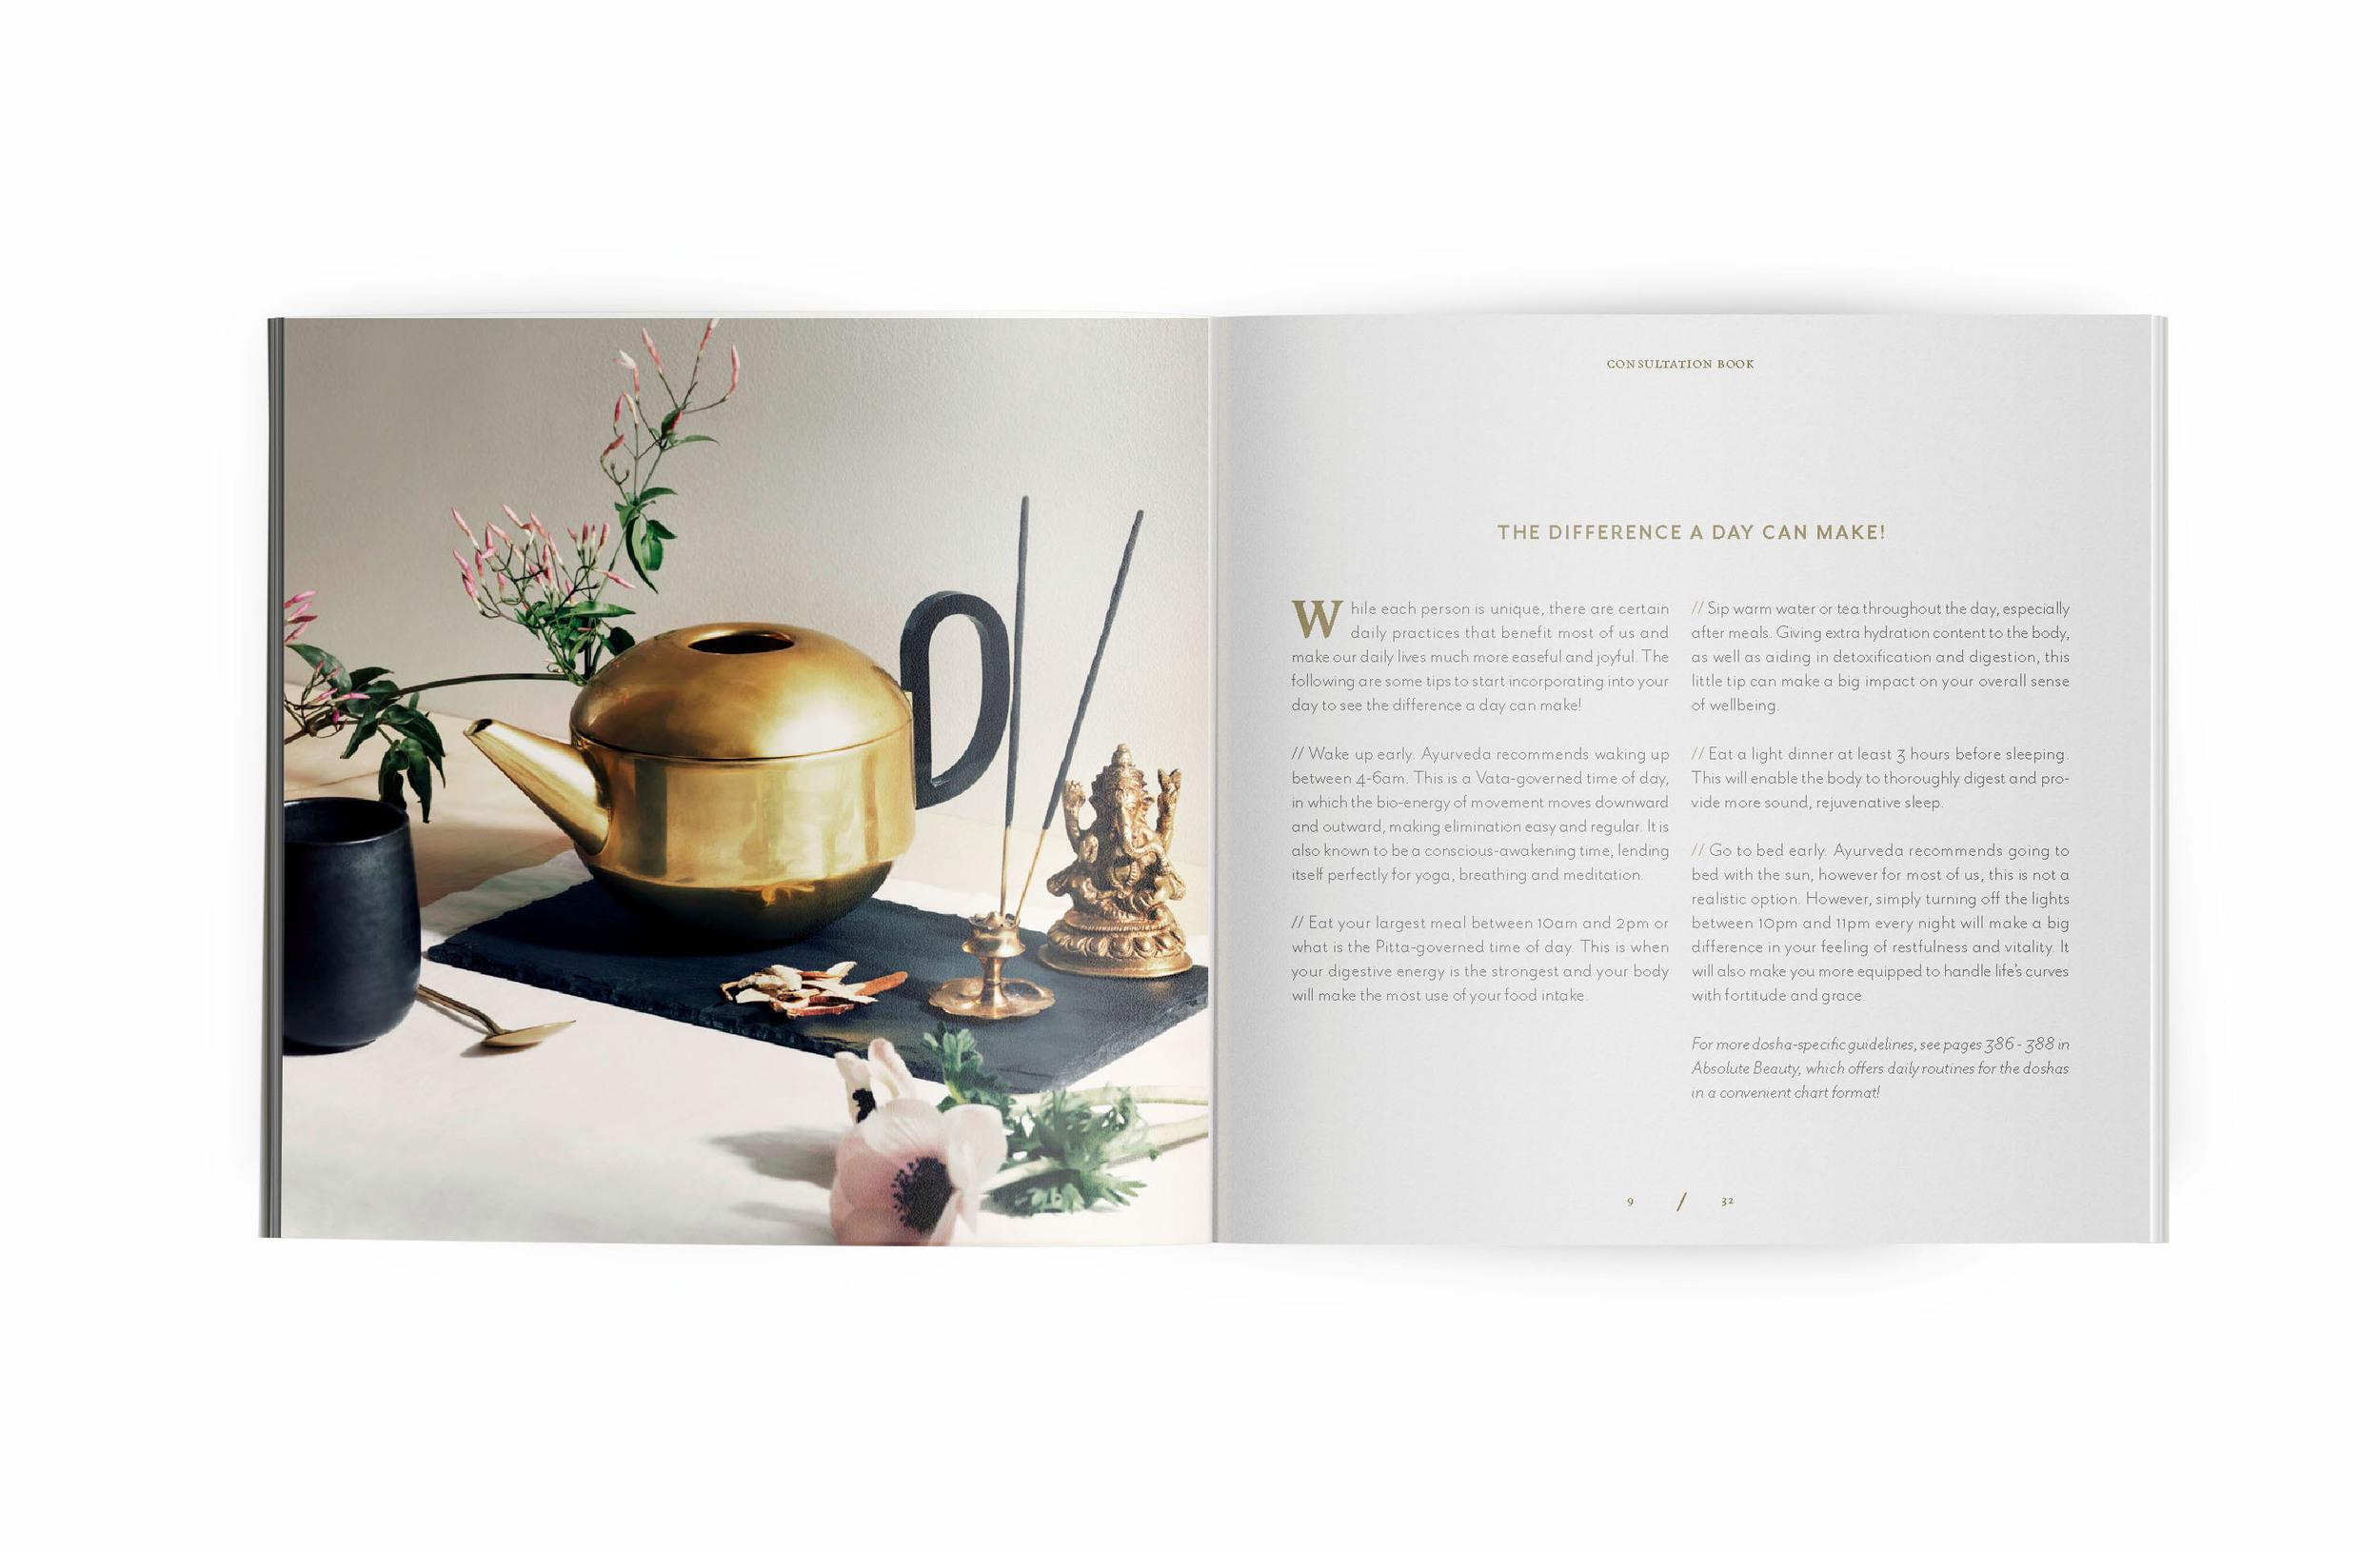 Pratima_consultationBook_1.jpg